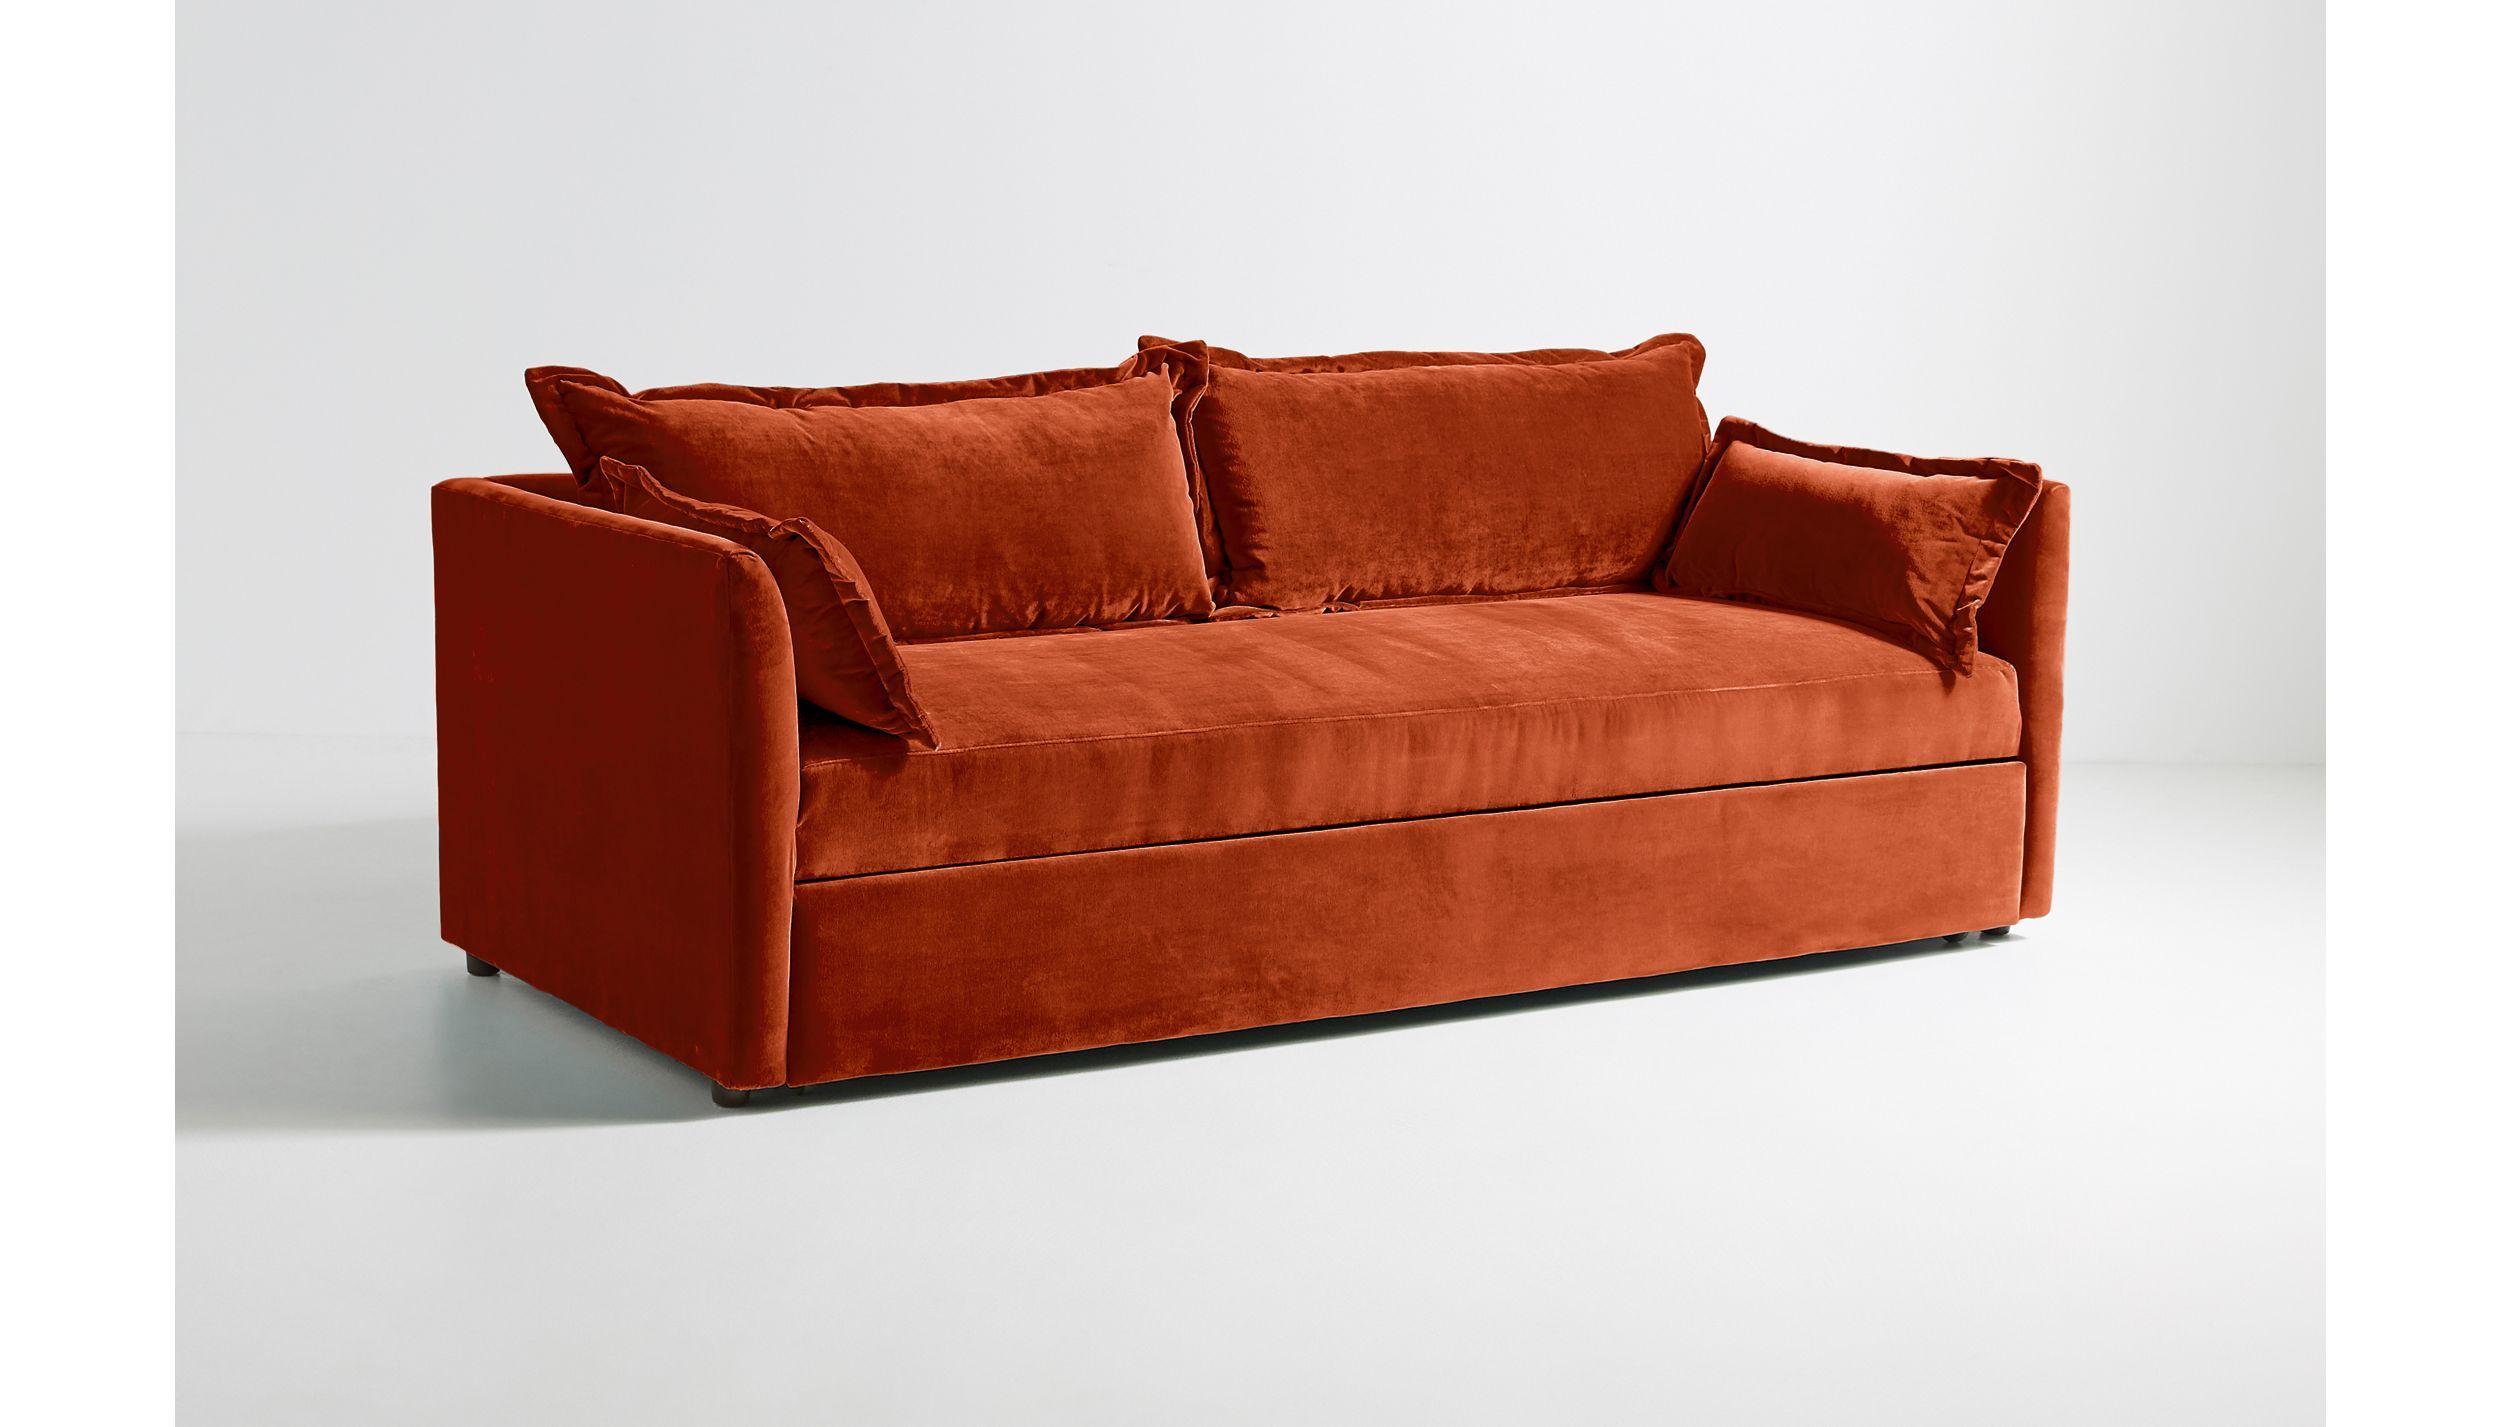 Denver Trundle Sleeper Sofa In 2019 Design Your Life